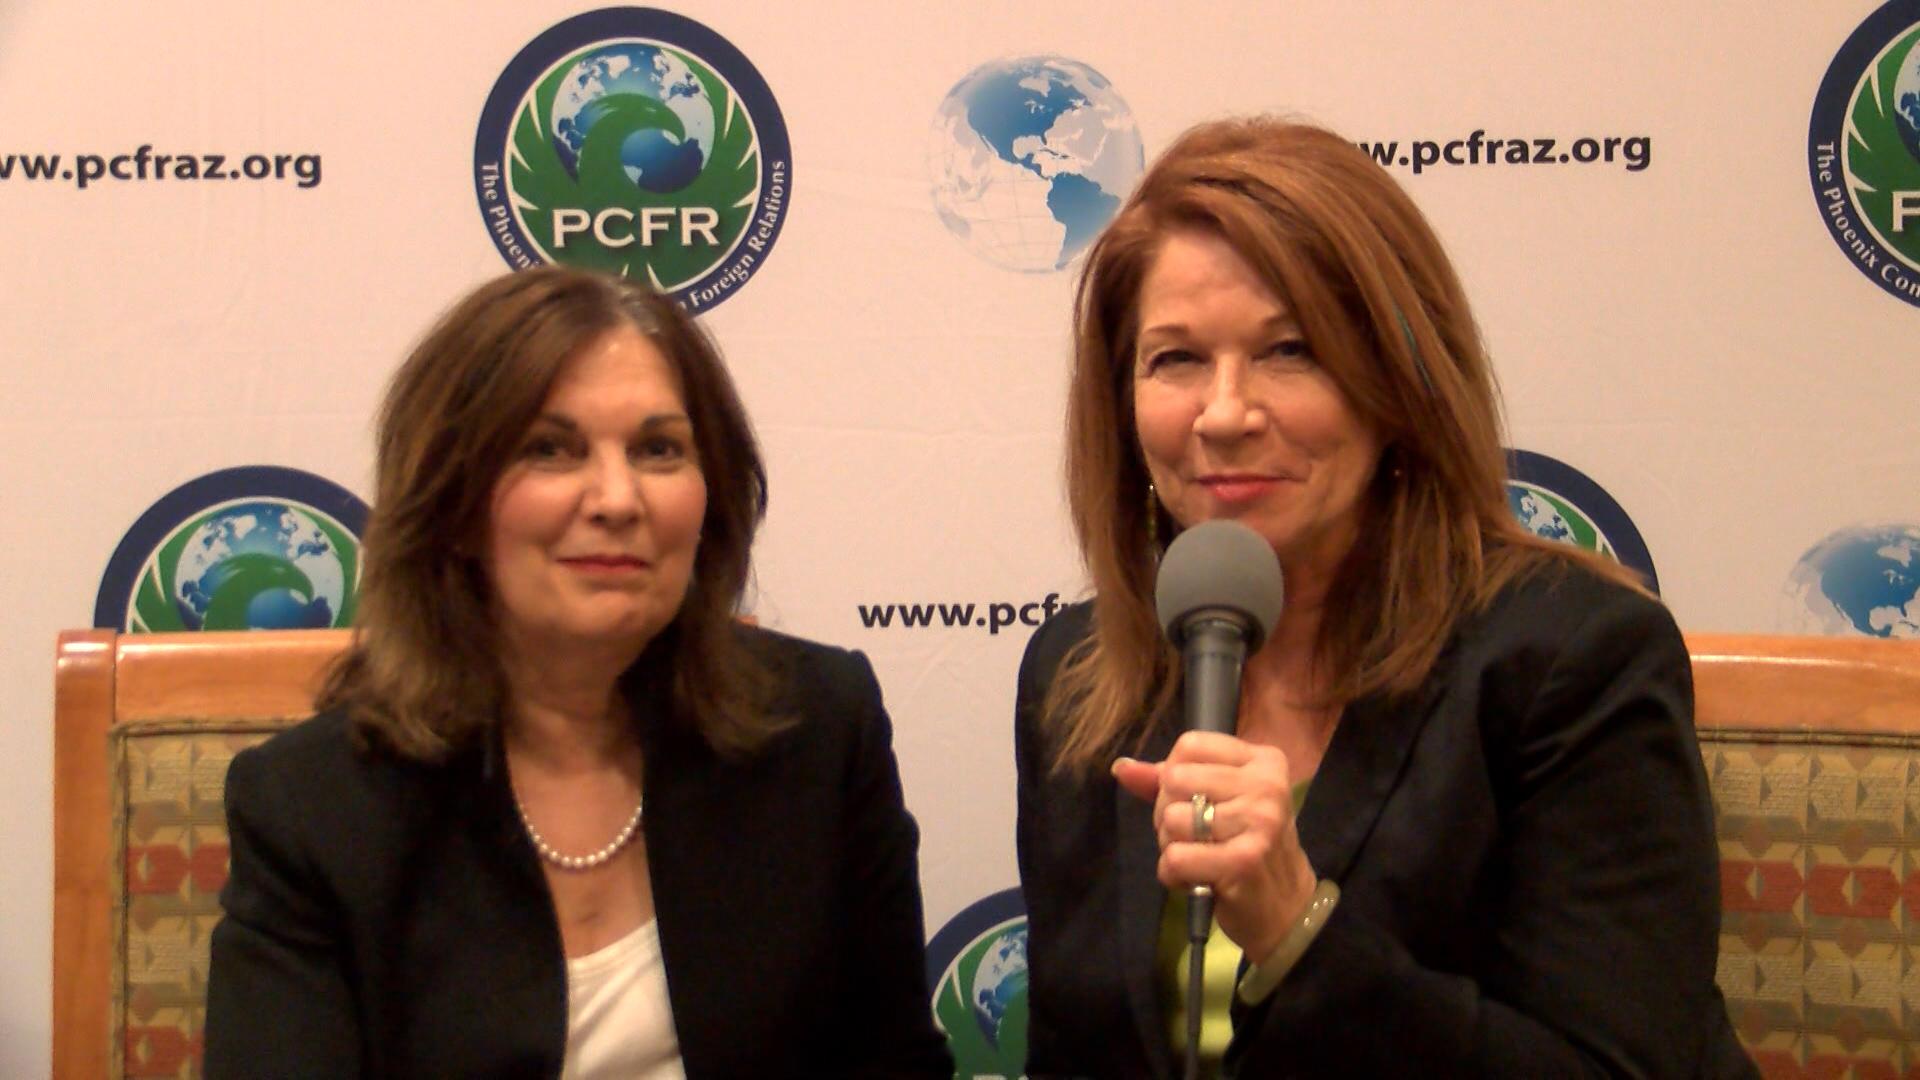 Dr. Eileen Borris Interviewed on The DM Zone